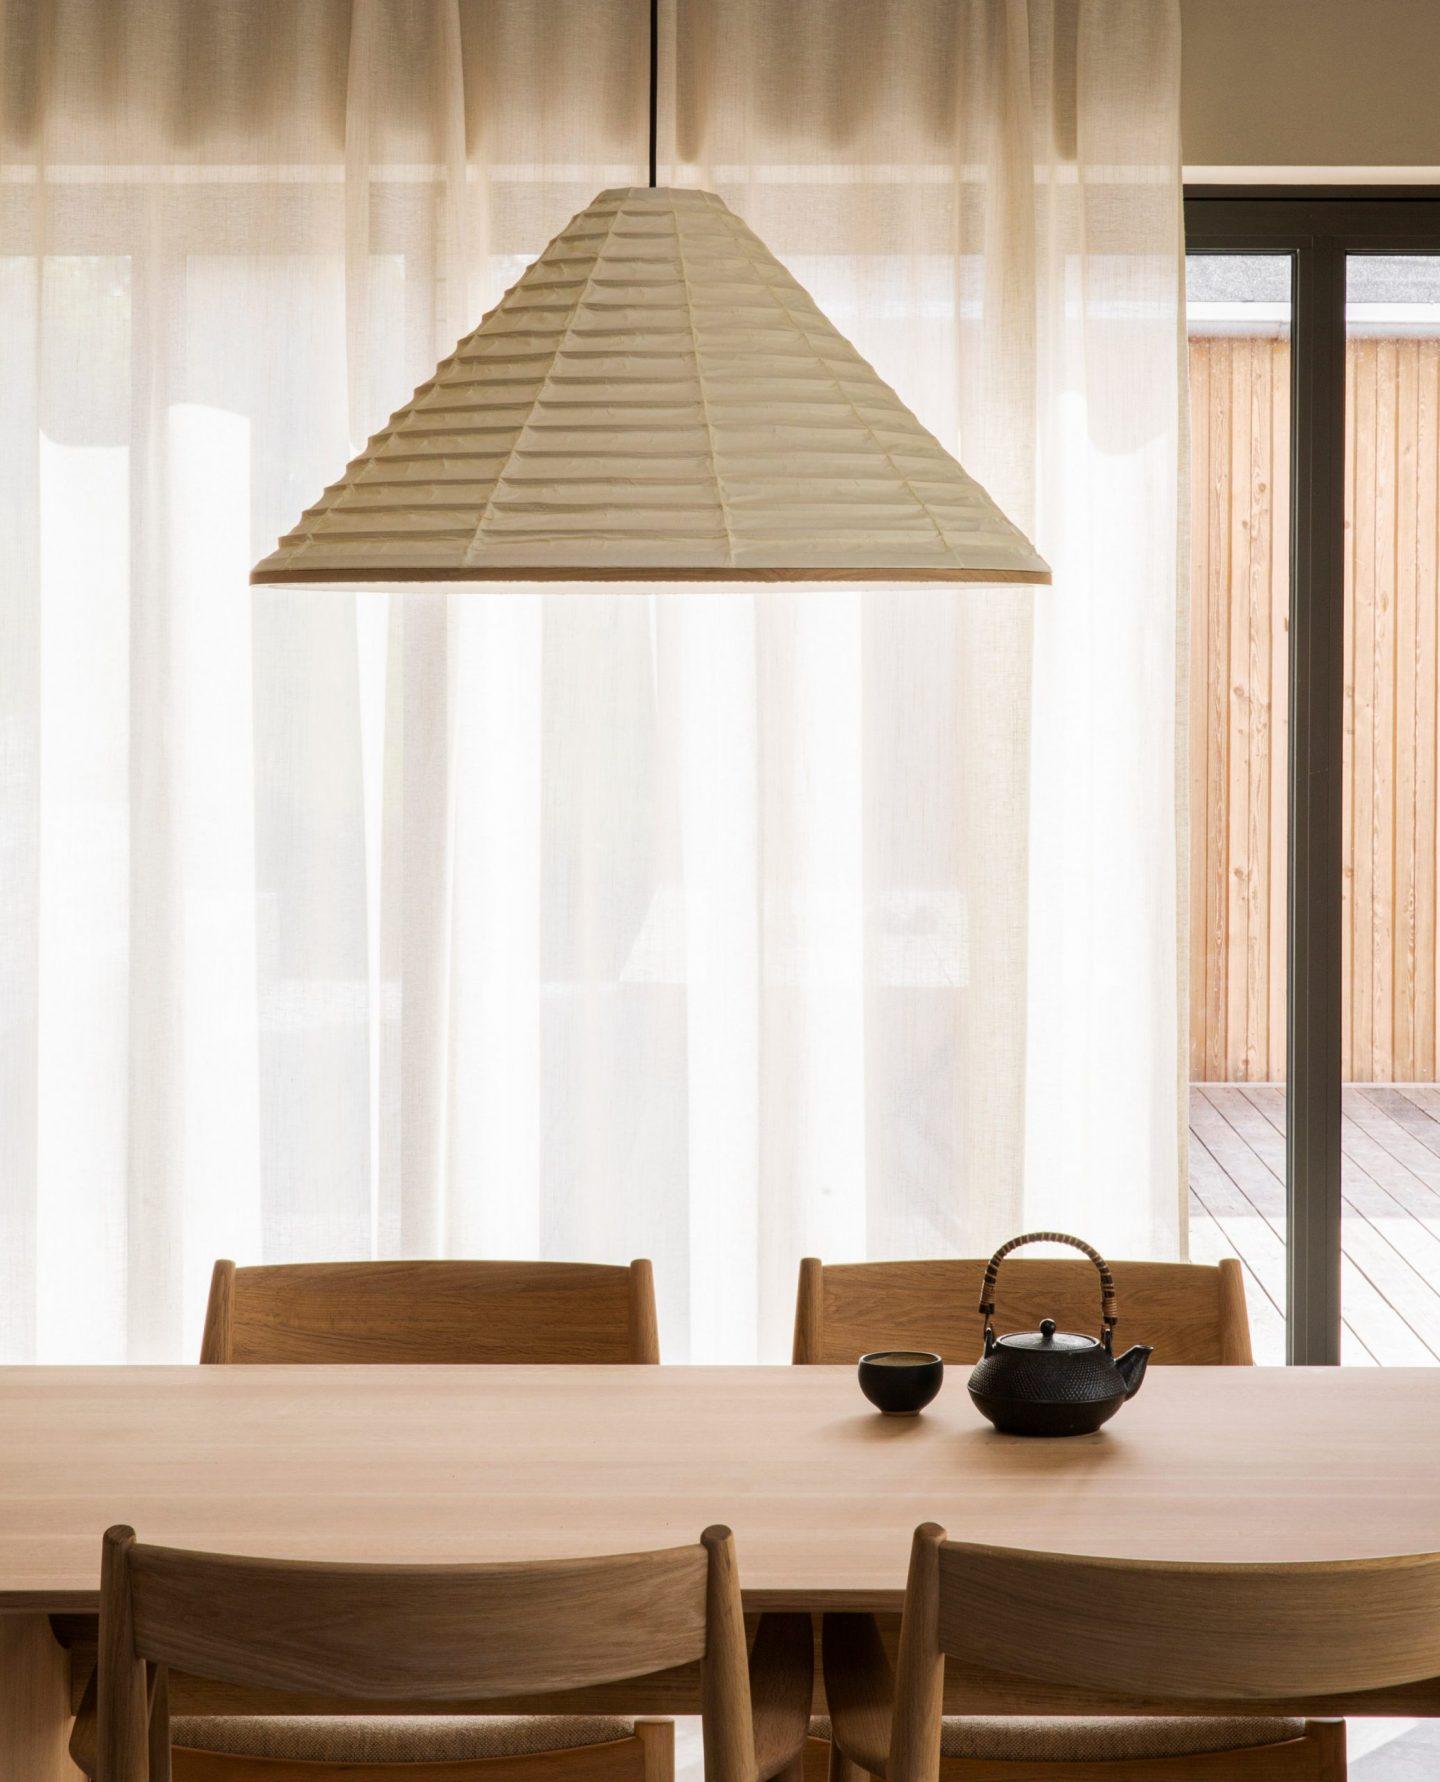 IGNANT-Architecture-Norm-Architects-Archipelago-House-018